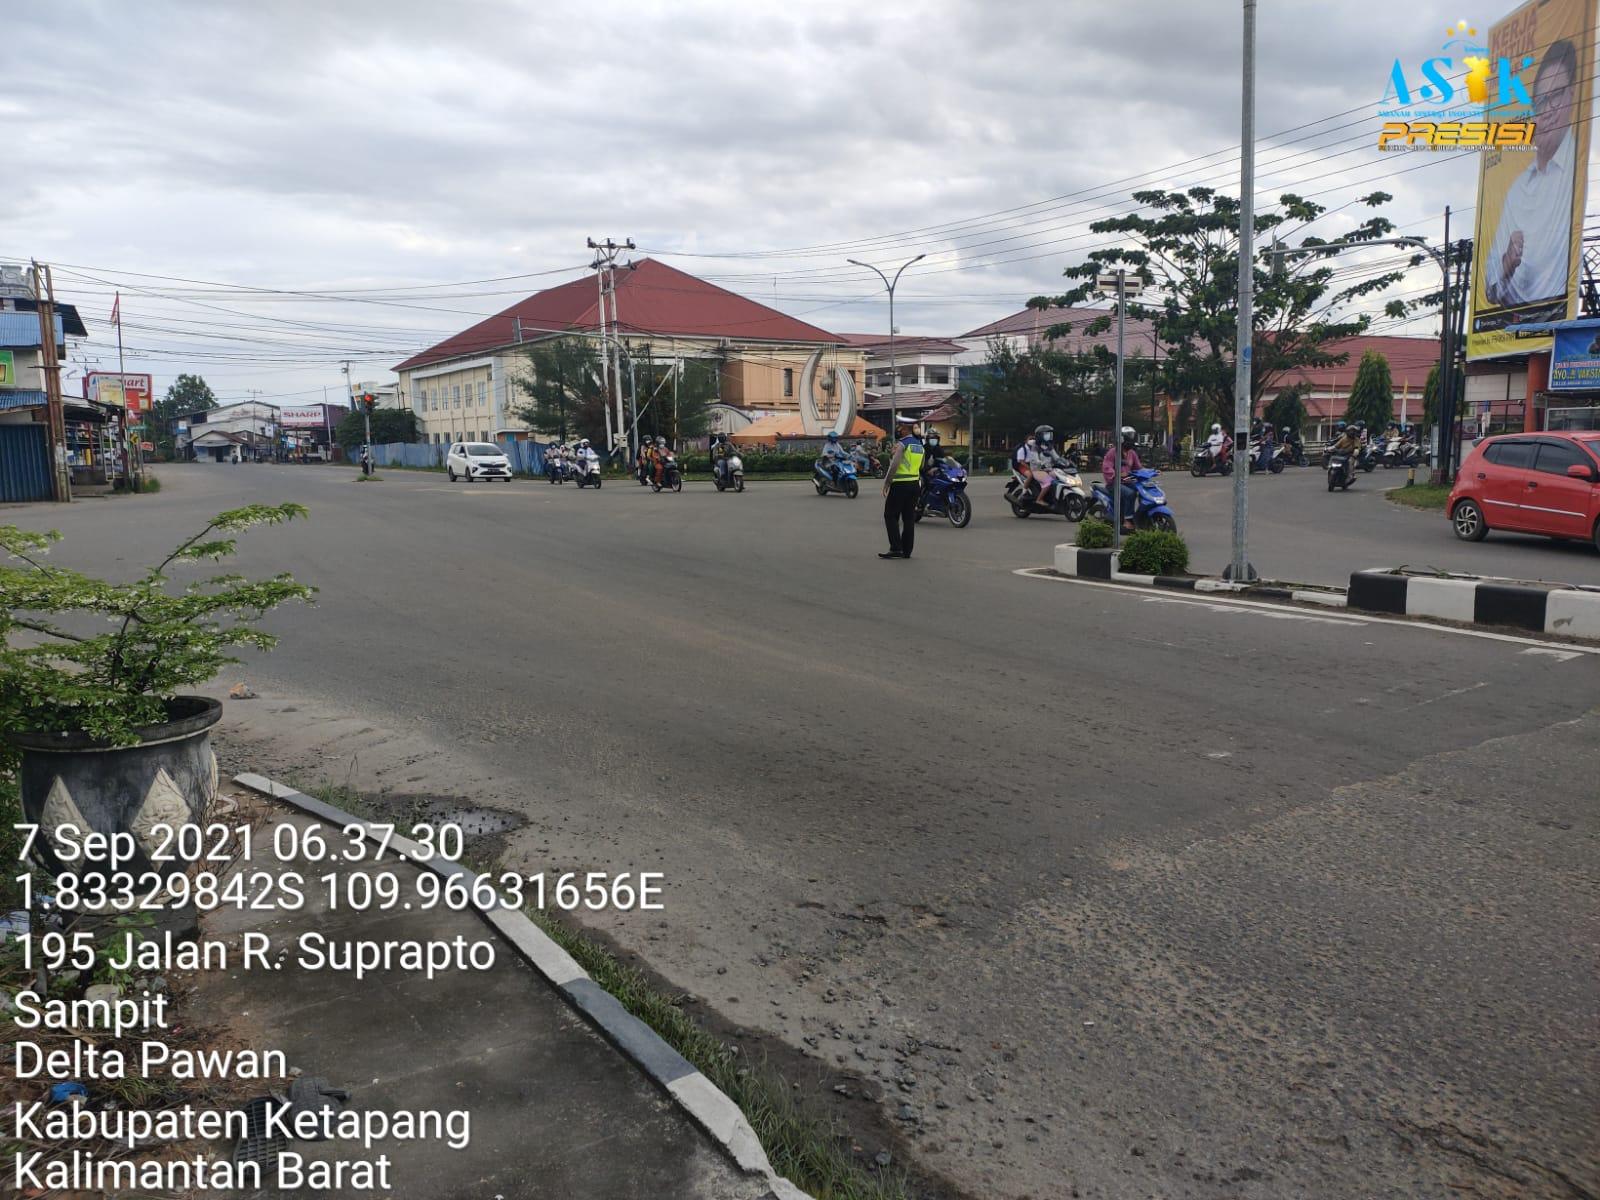 Satlantas Ketapang Berikan Pelayanan kepada Masyarakat dengan Ploting Point